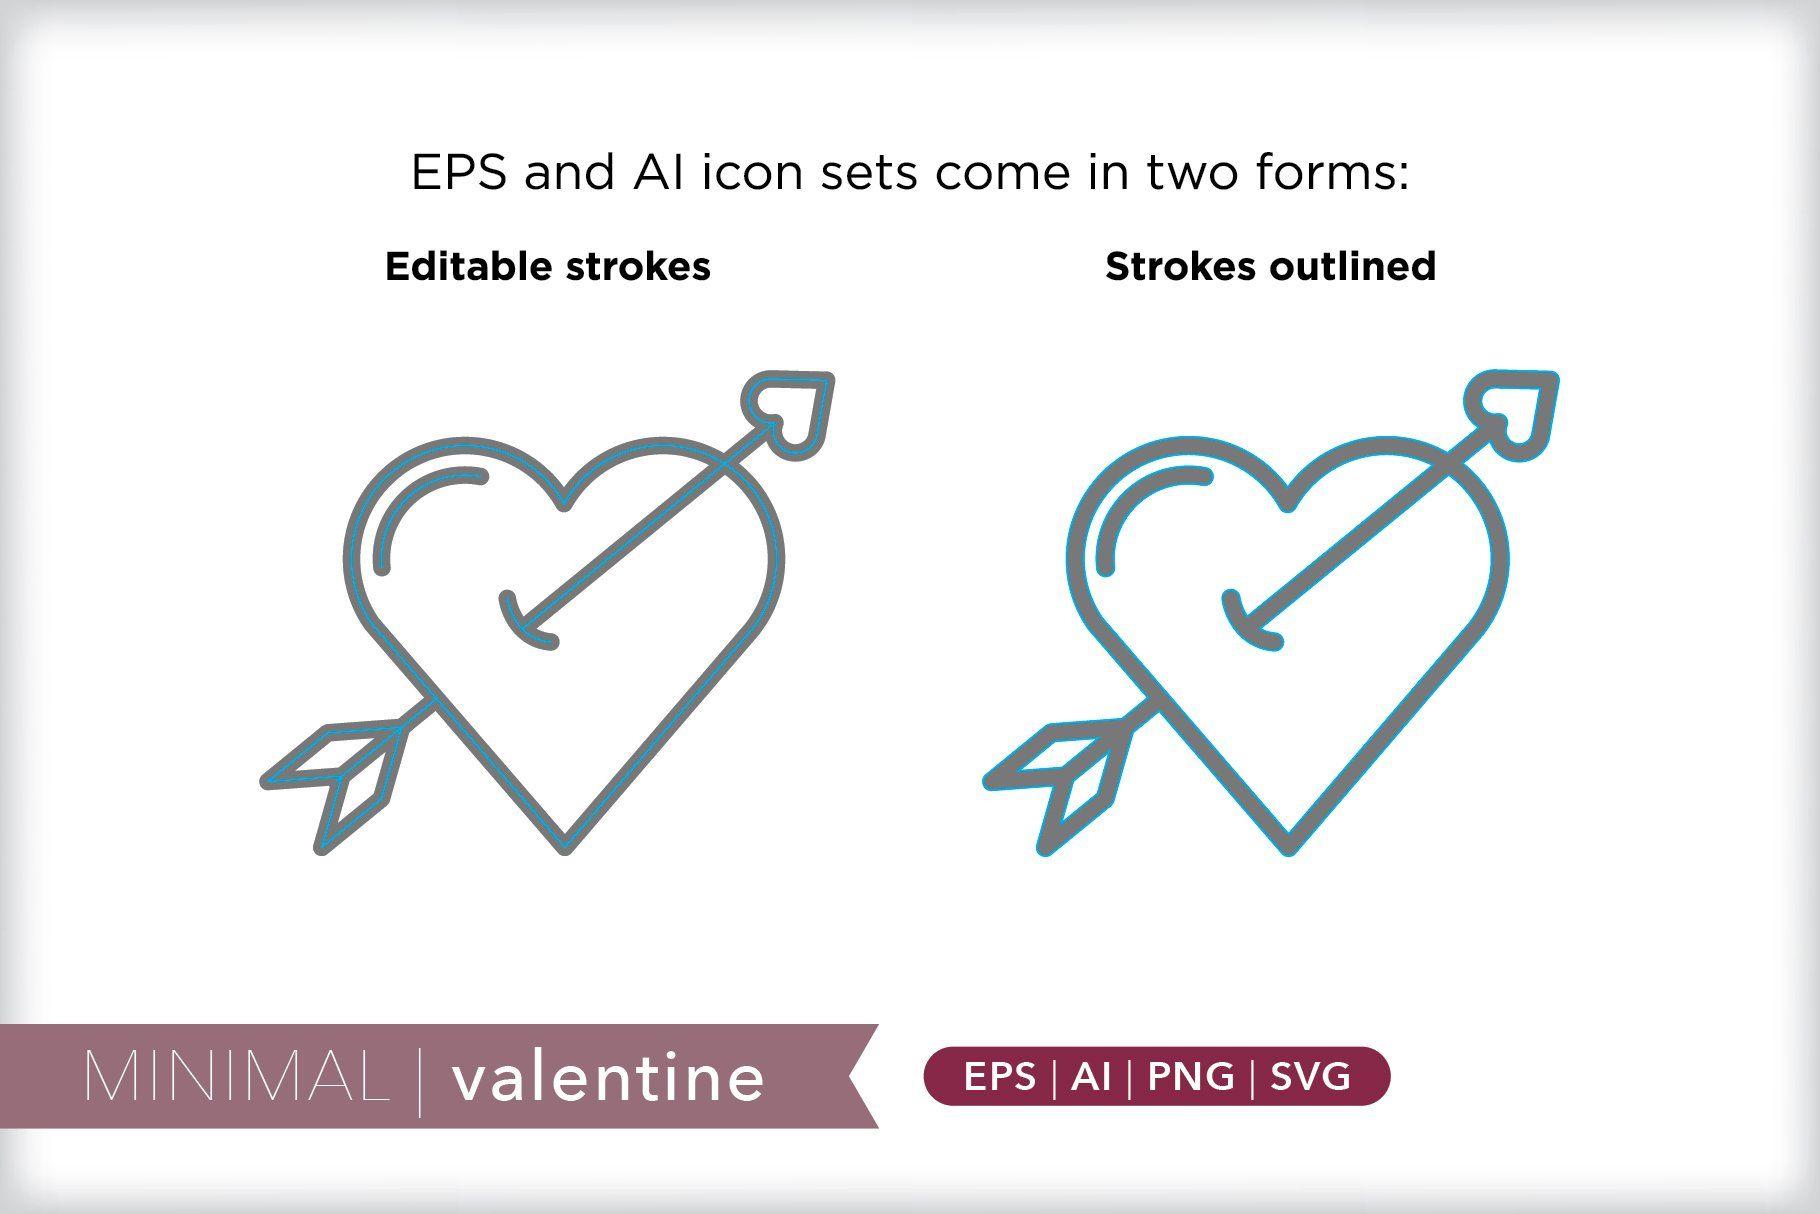 Minimal valentine icons Icon, Social media images